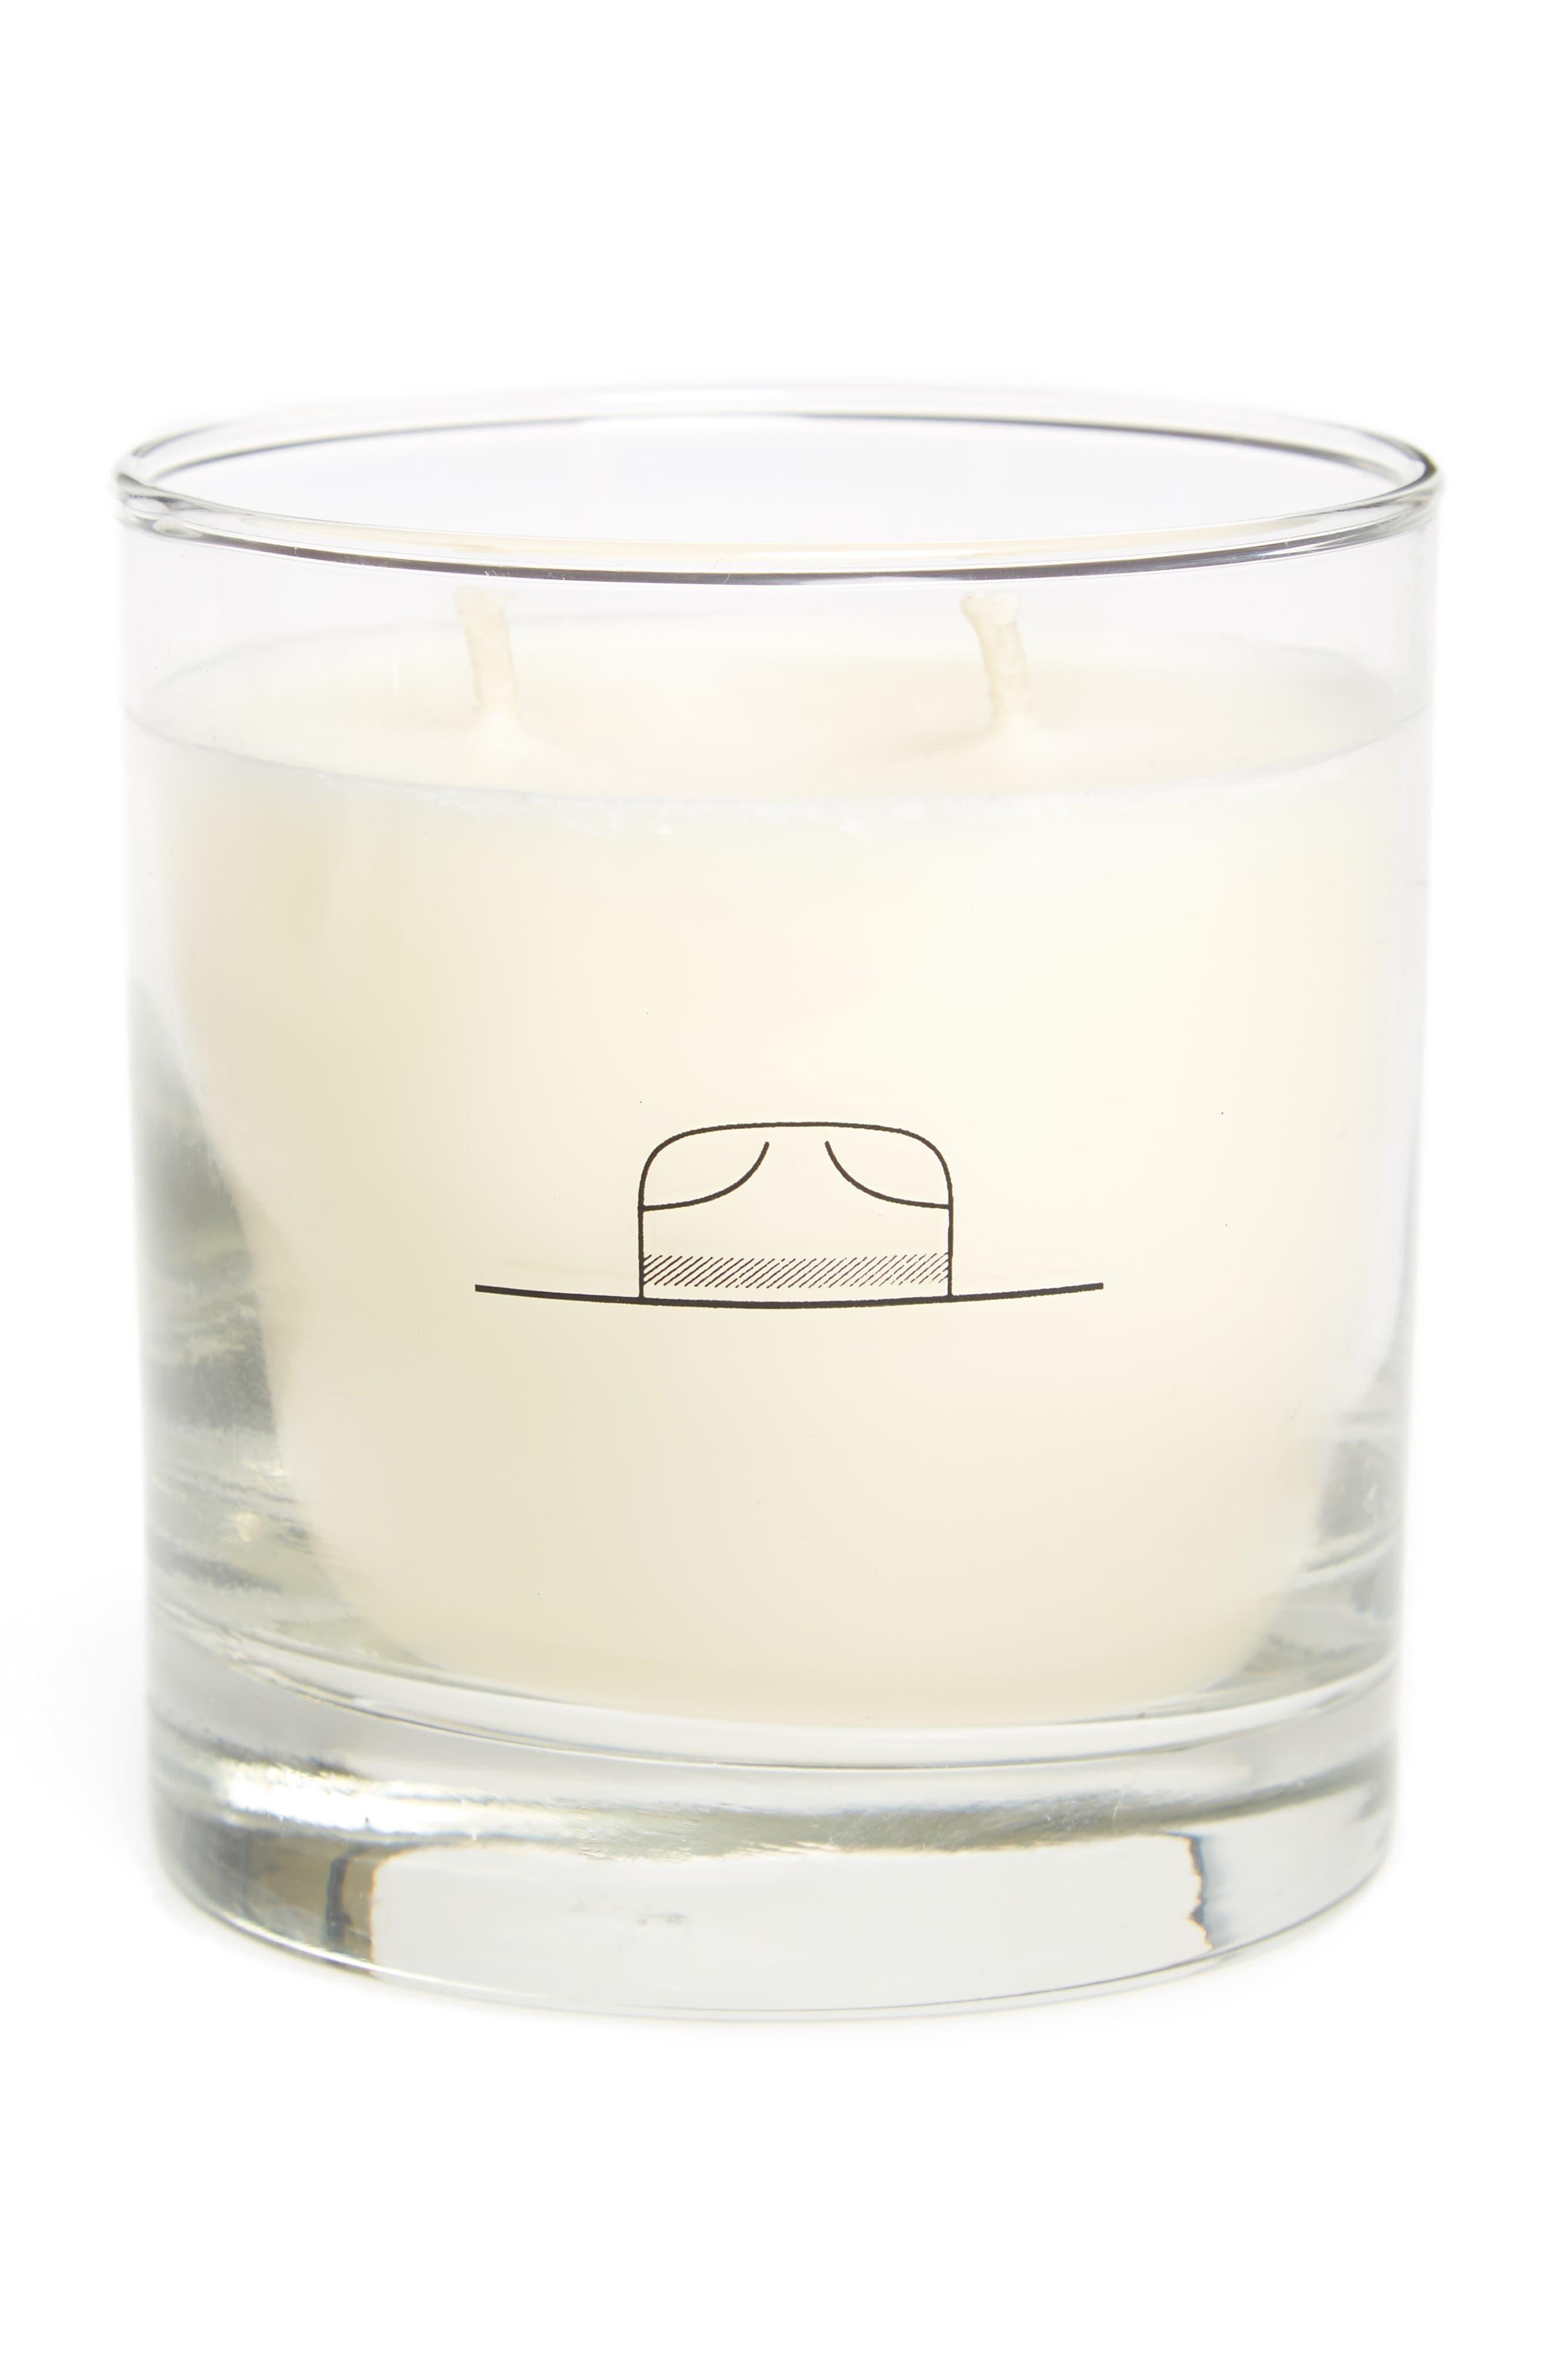 Main Image - Ranger Station Whiskey Glass Candle